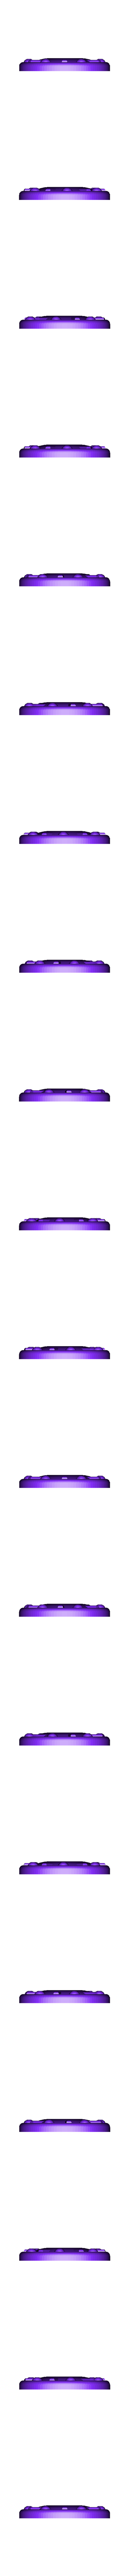 potentiometer_knob_1_x2.stl Download free STL file ORCA communicator (Godzilla) • 3D printing object, poblocki1982